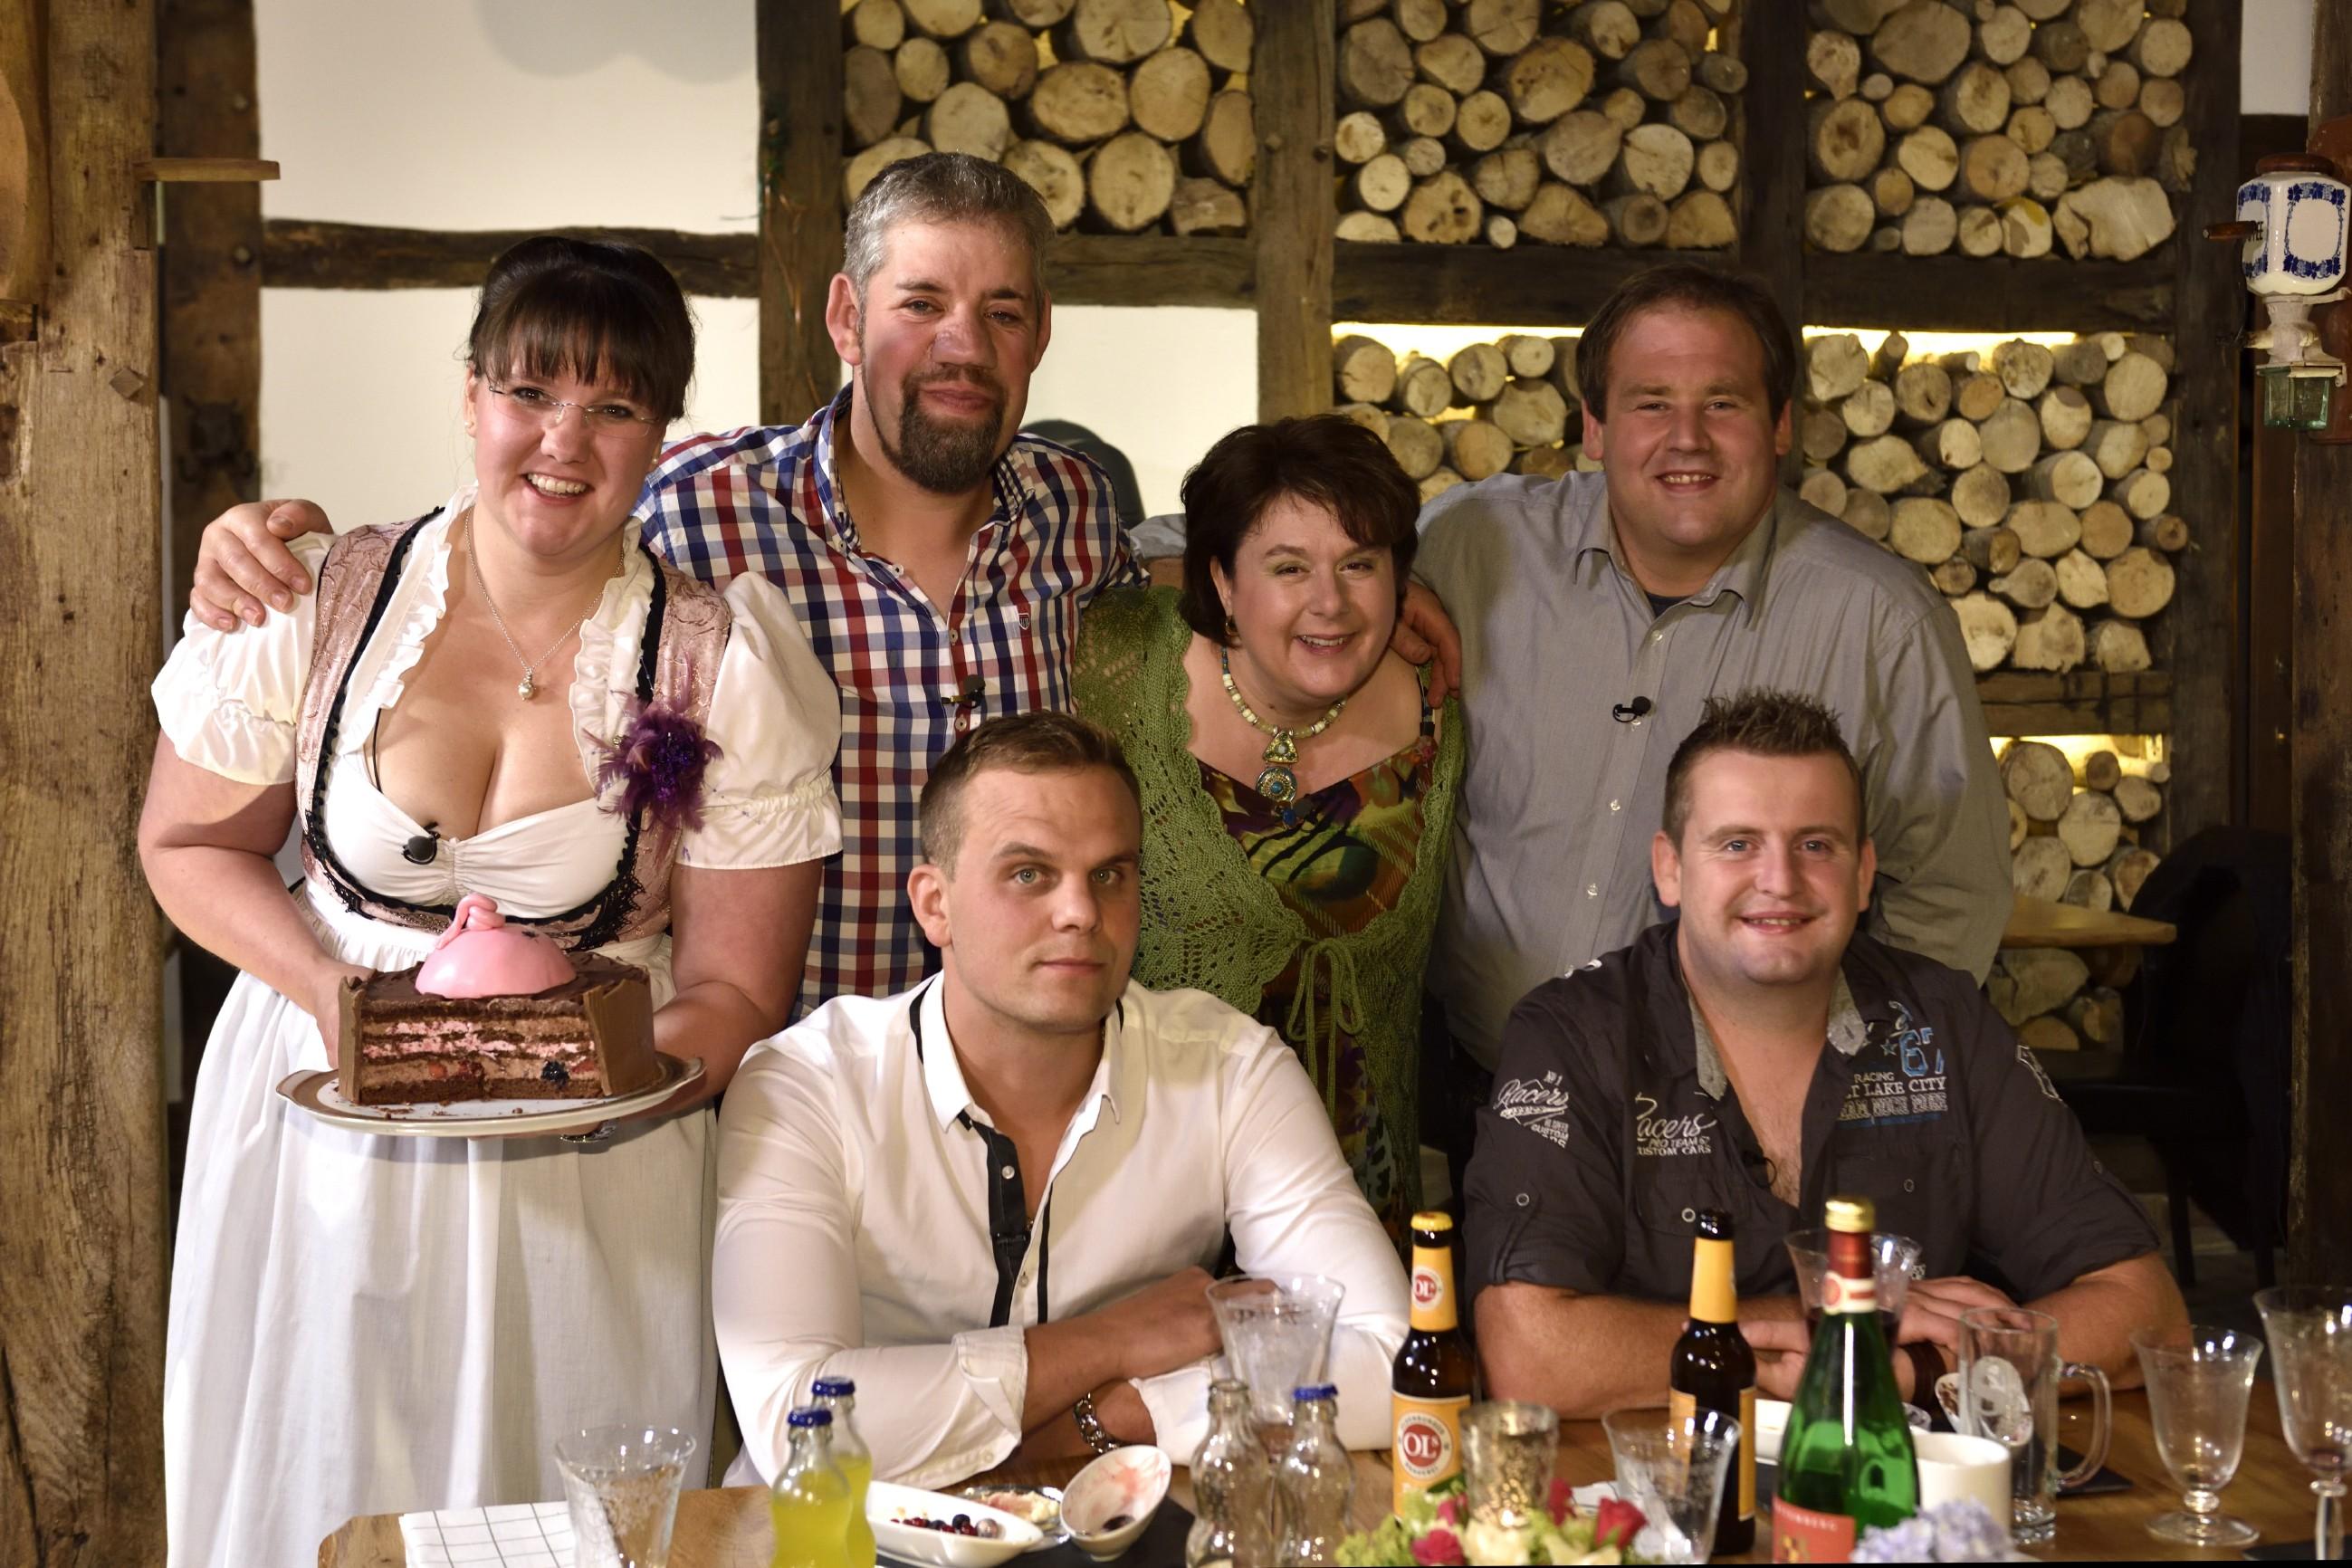 H.v.l.: Katja, Uwe, Iris, Marcel V.v.l.: Gunther, Sebastian